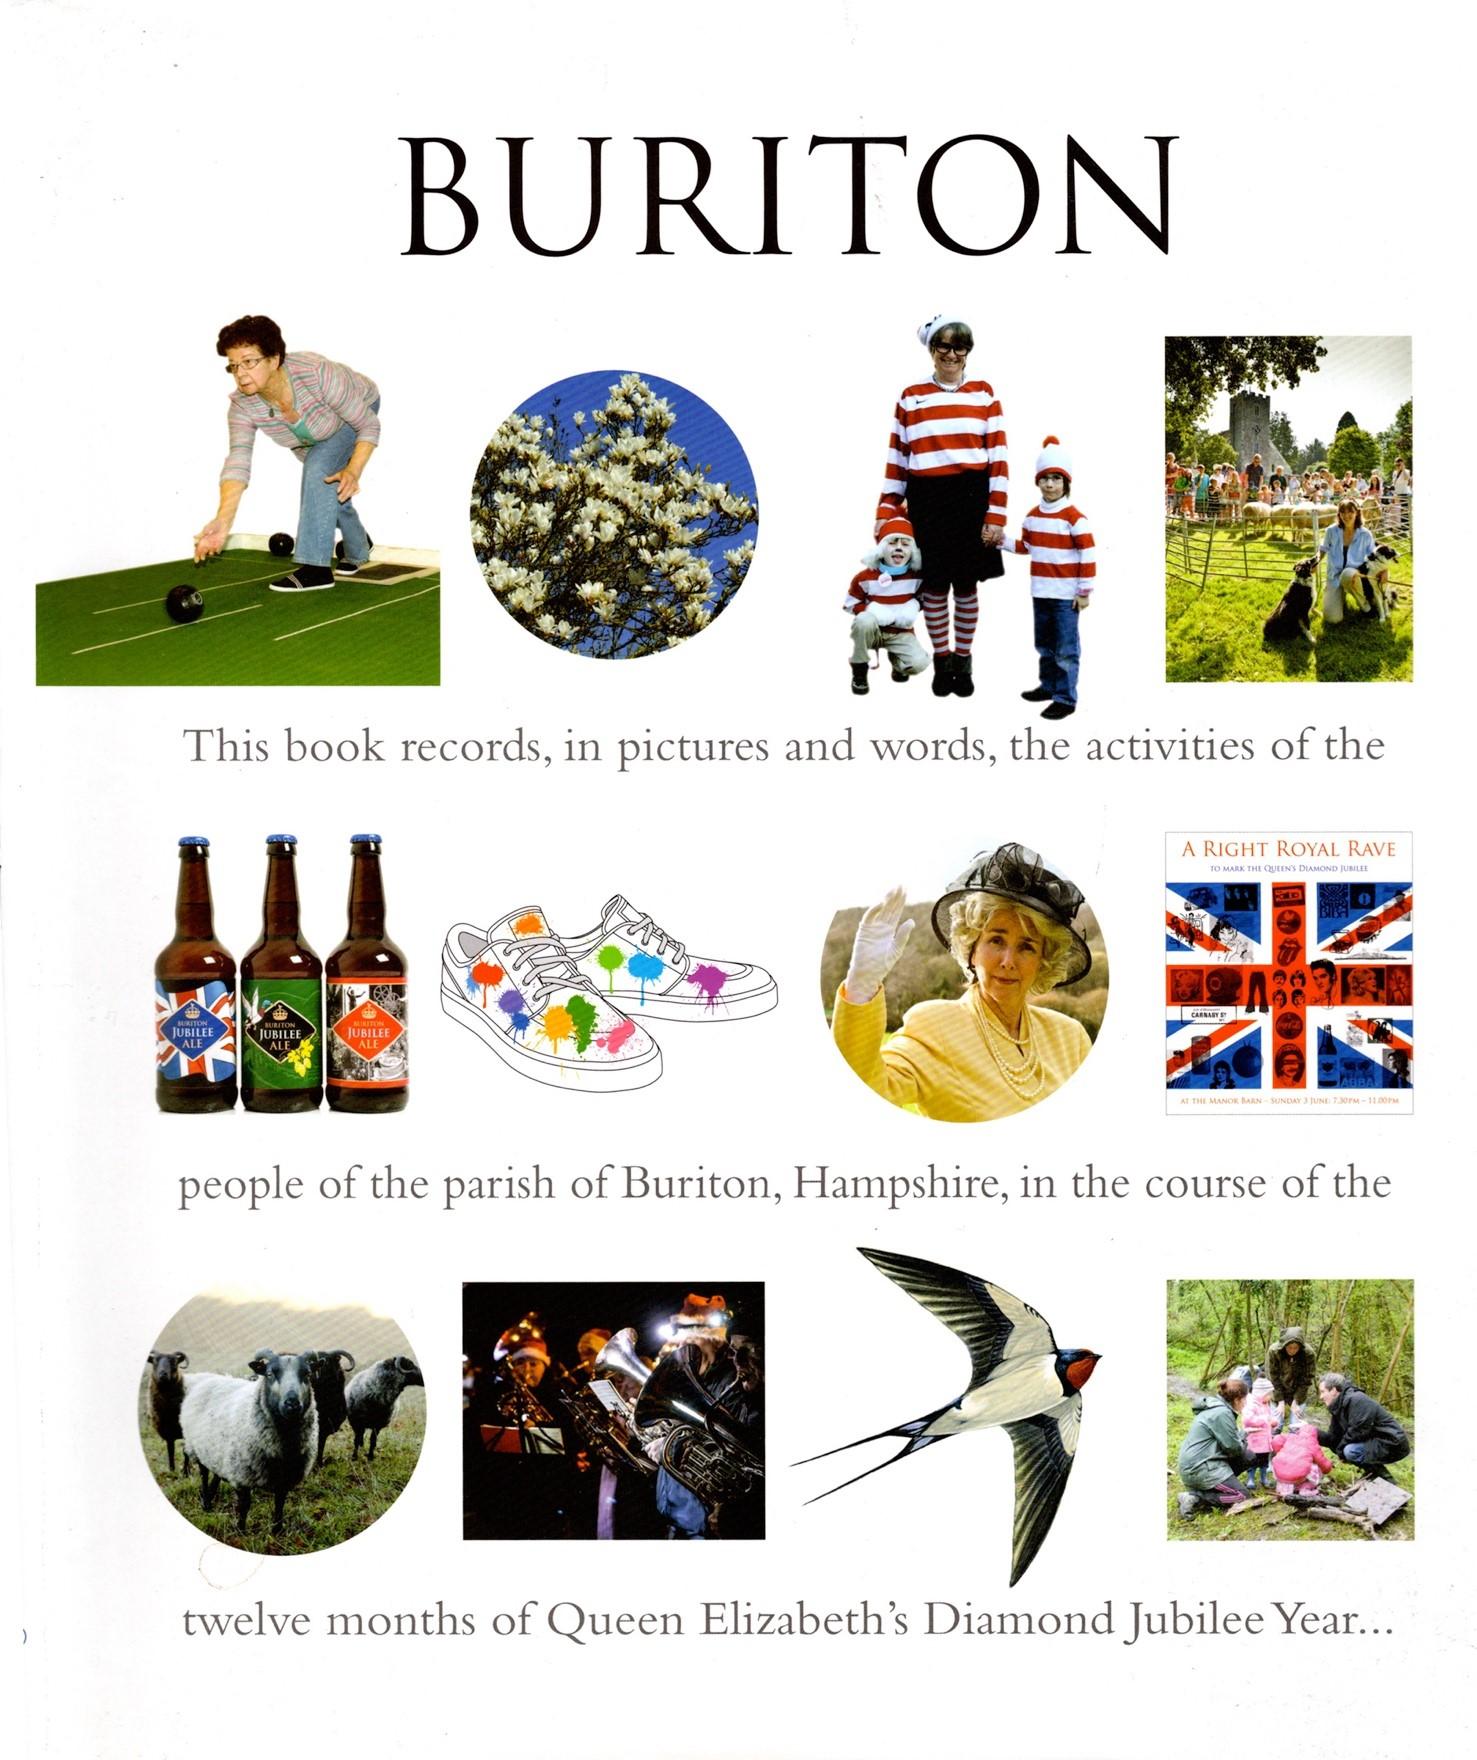 buriton book